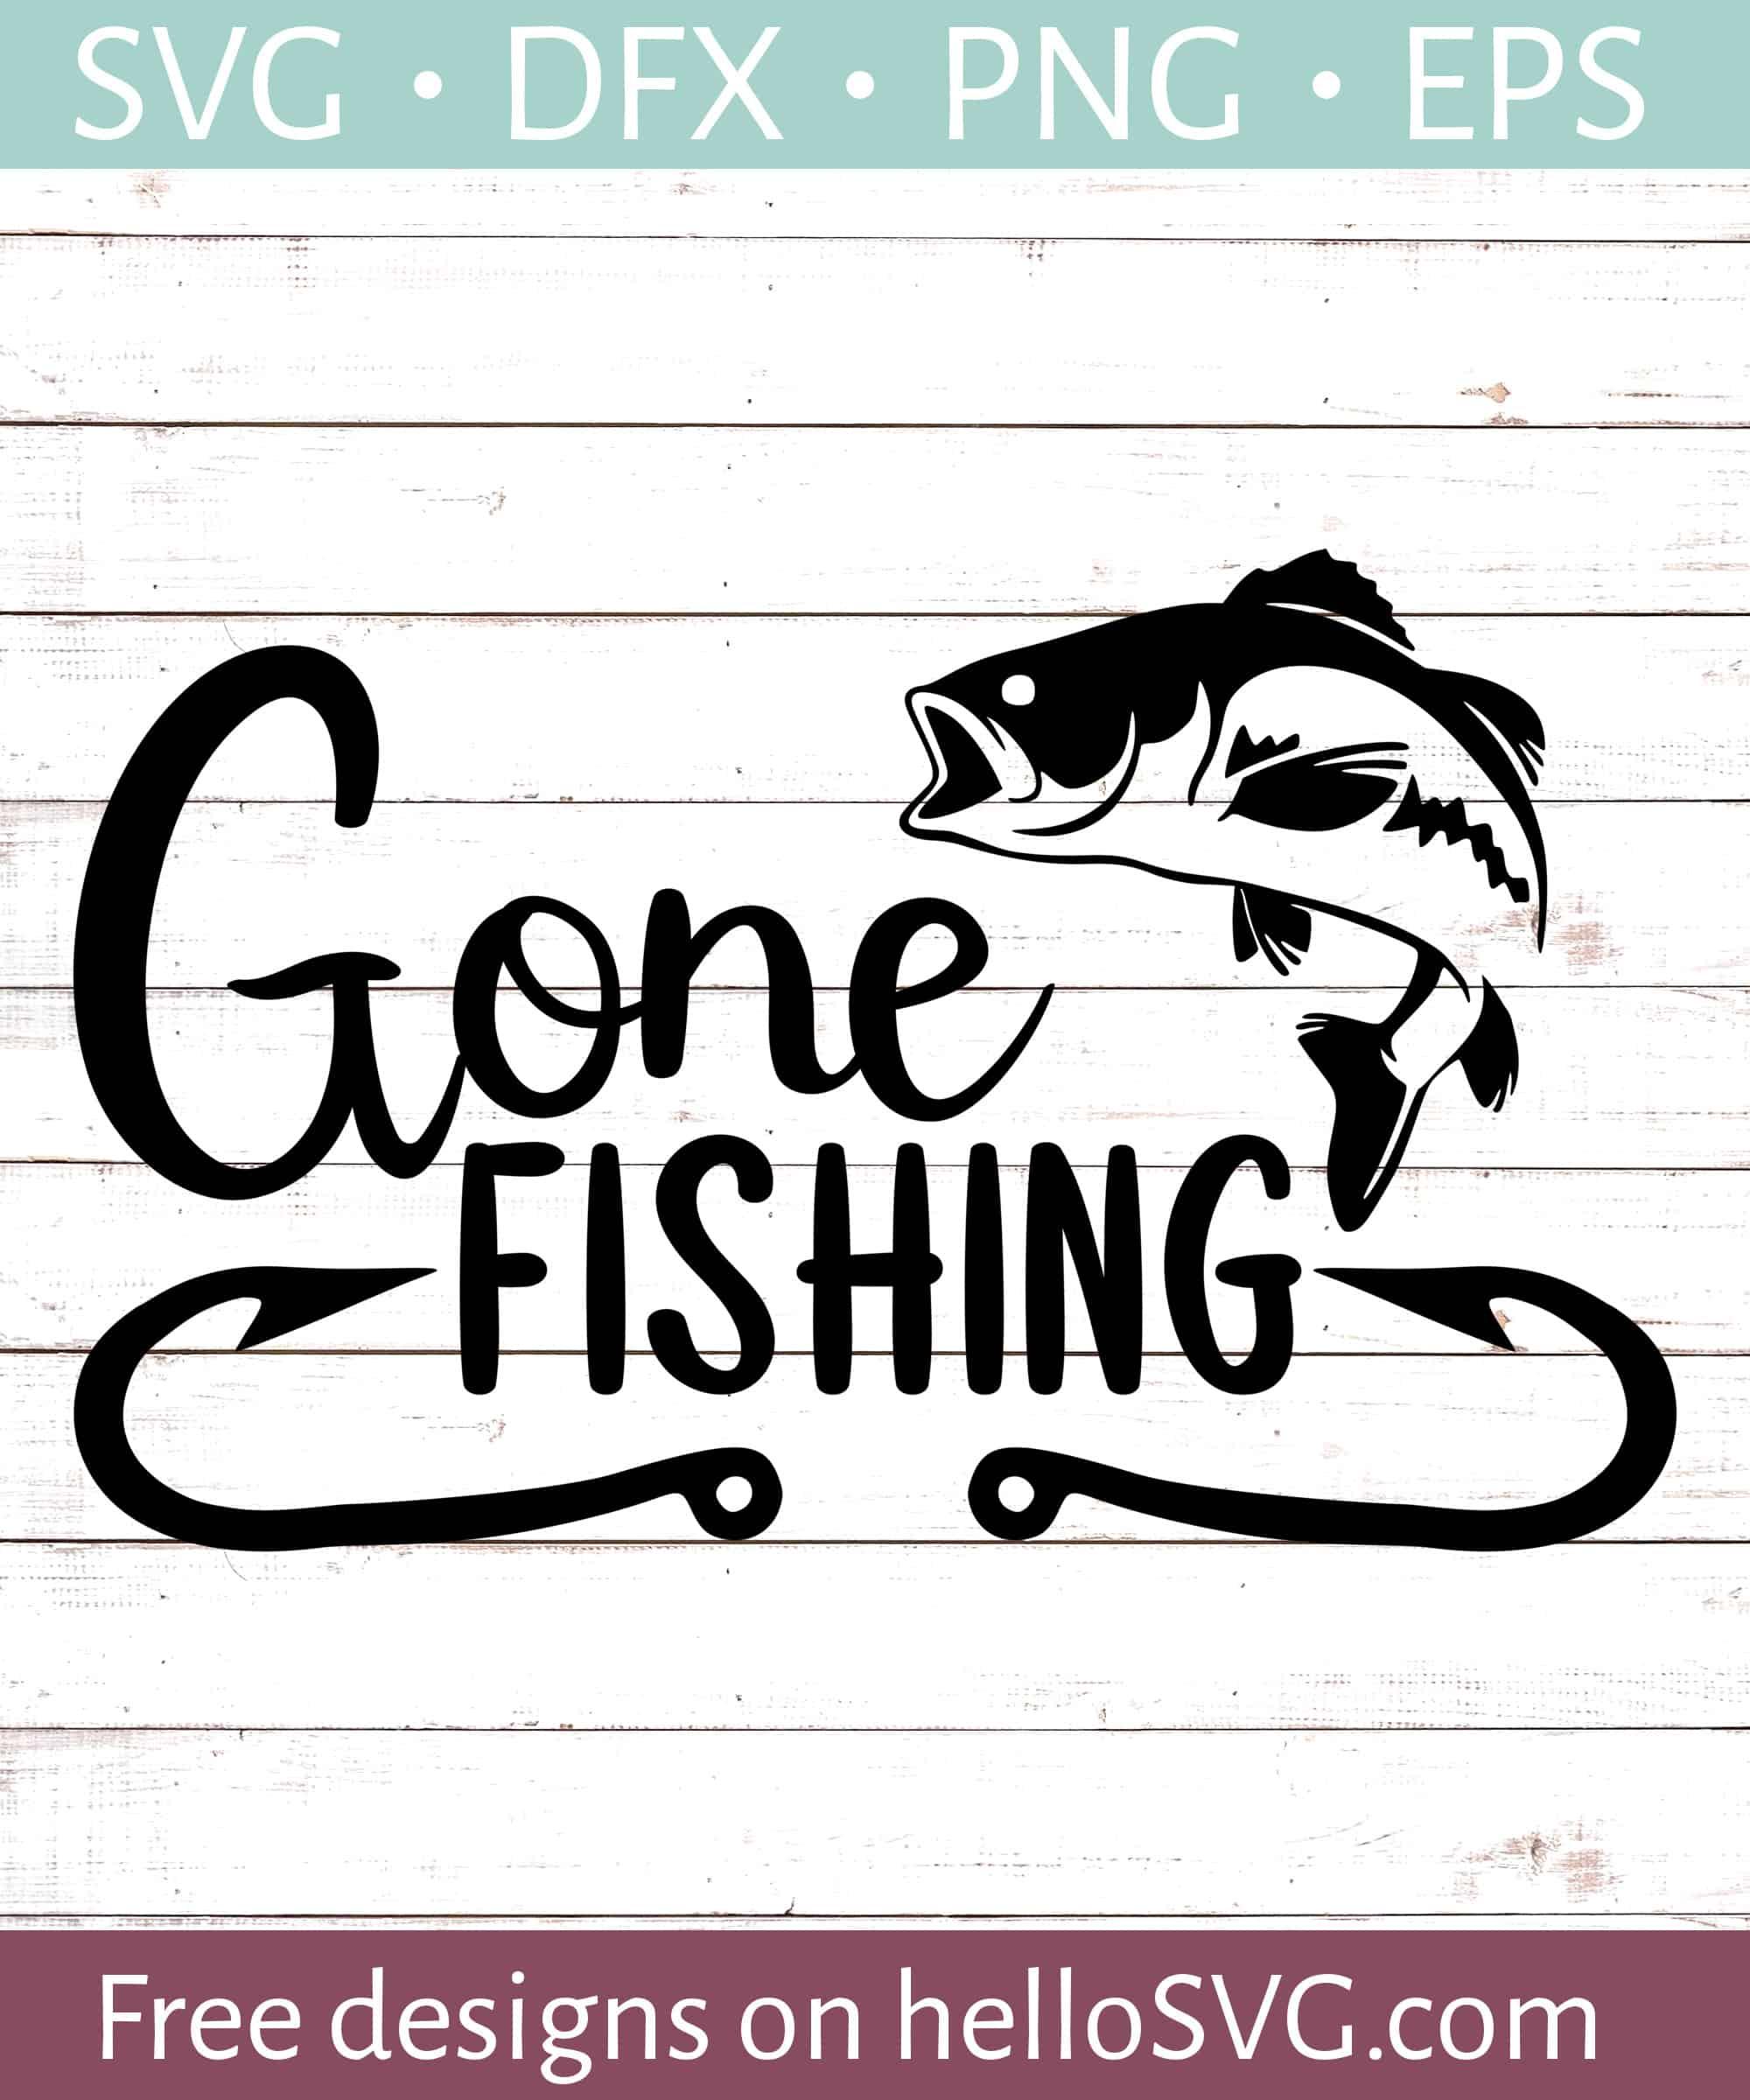 01d8c92b3 Gone Fishing #3 SVG - Free SVG files | HelloSVG.com